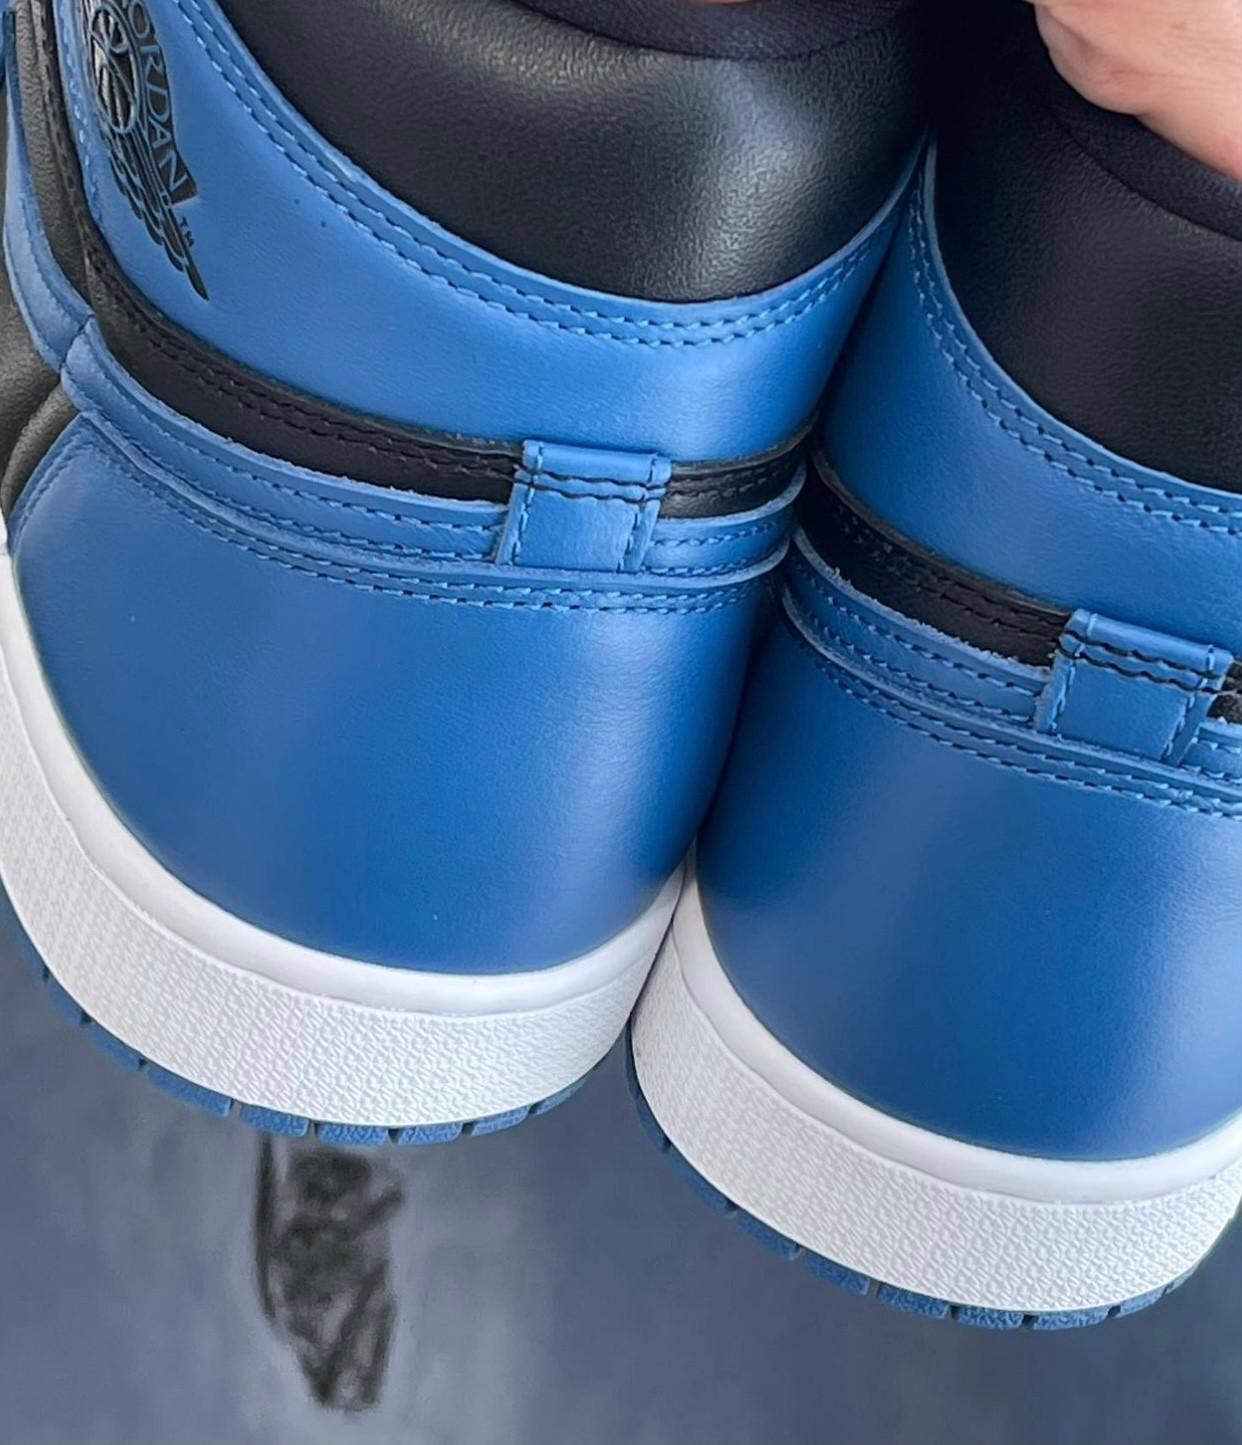 AJ,Air Jordan 1 High OG,Dark M  OG 气息浓郁!全新「皇家蓝 2.0」Air Jordan 1实物曝光!